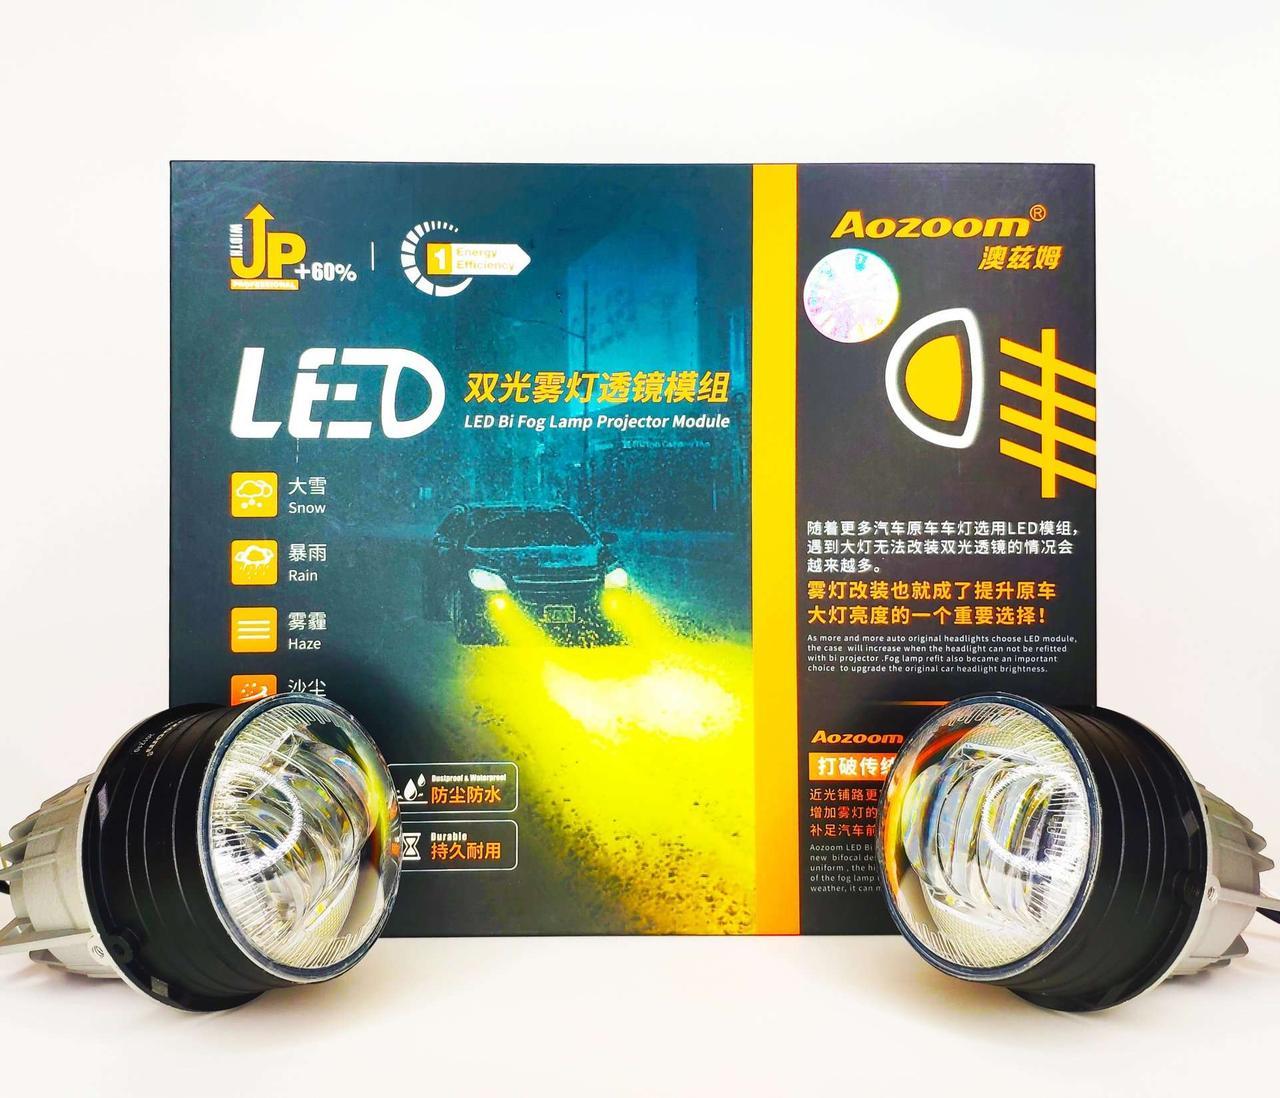 Протитуманні модулі Aozoom LED ALPF-01 FOG 3.0 дюйма